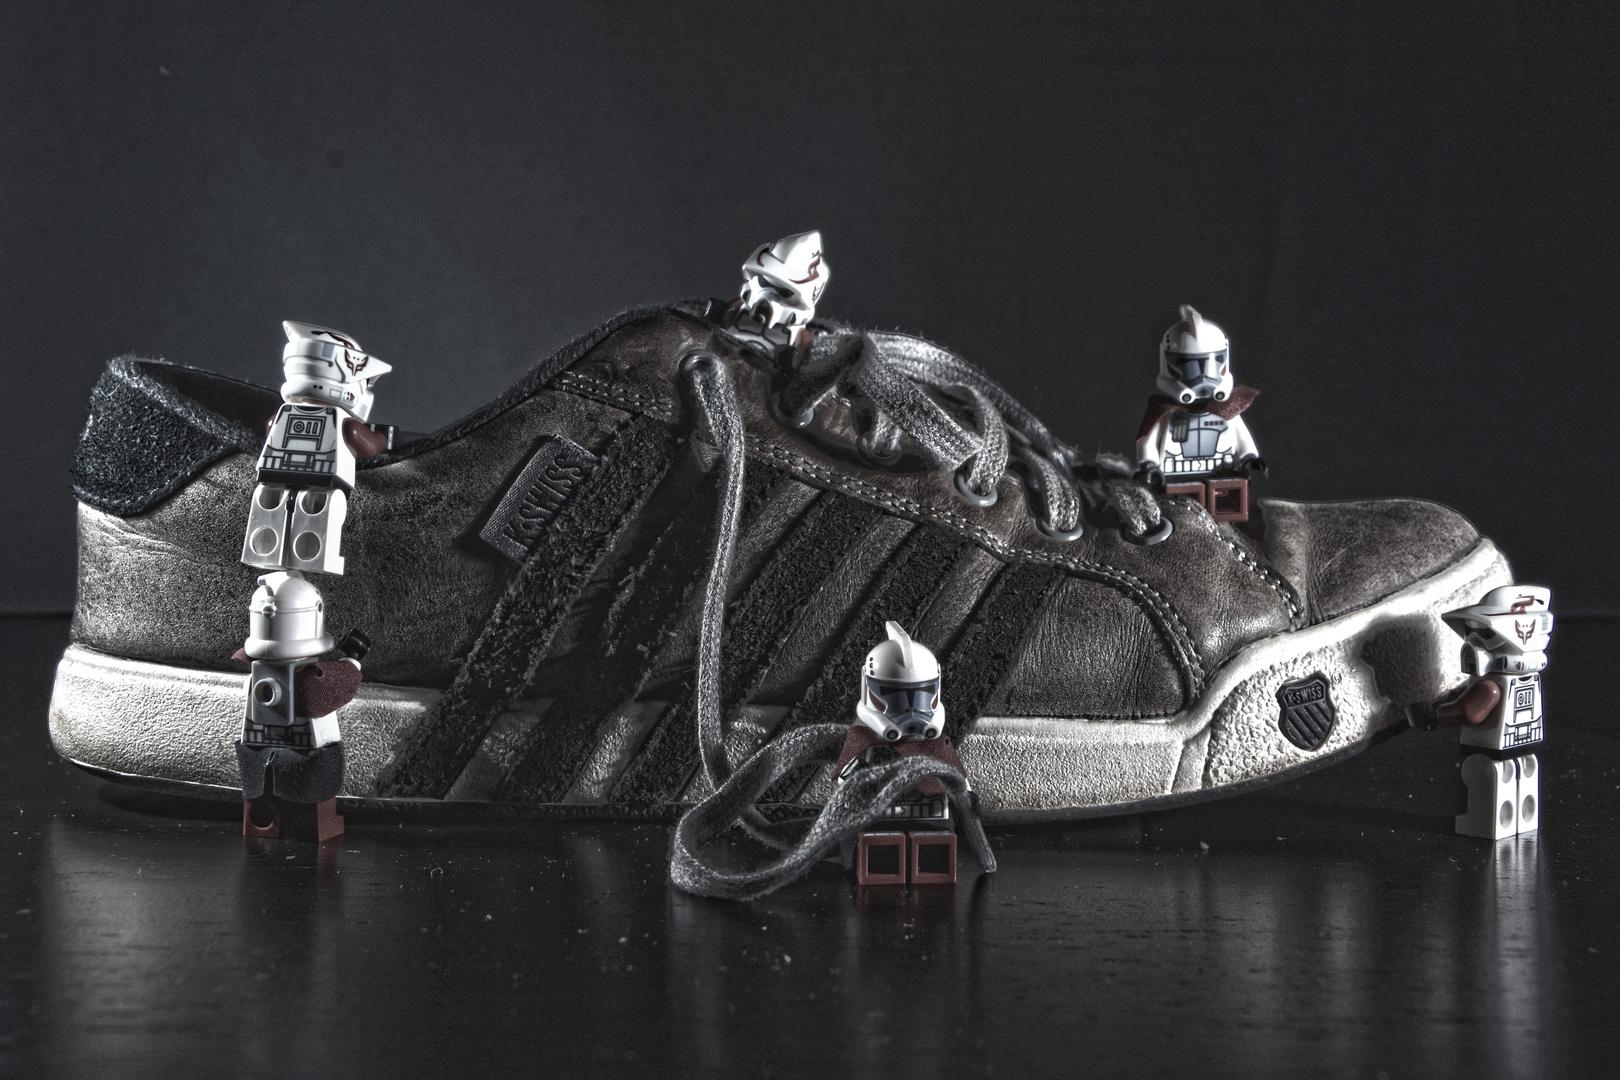 2 clones 1 shoe